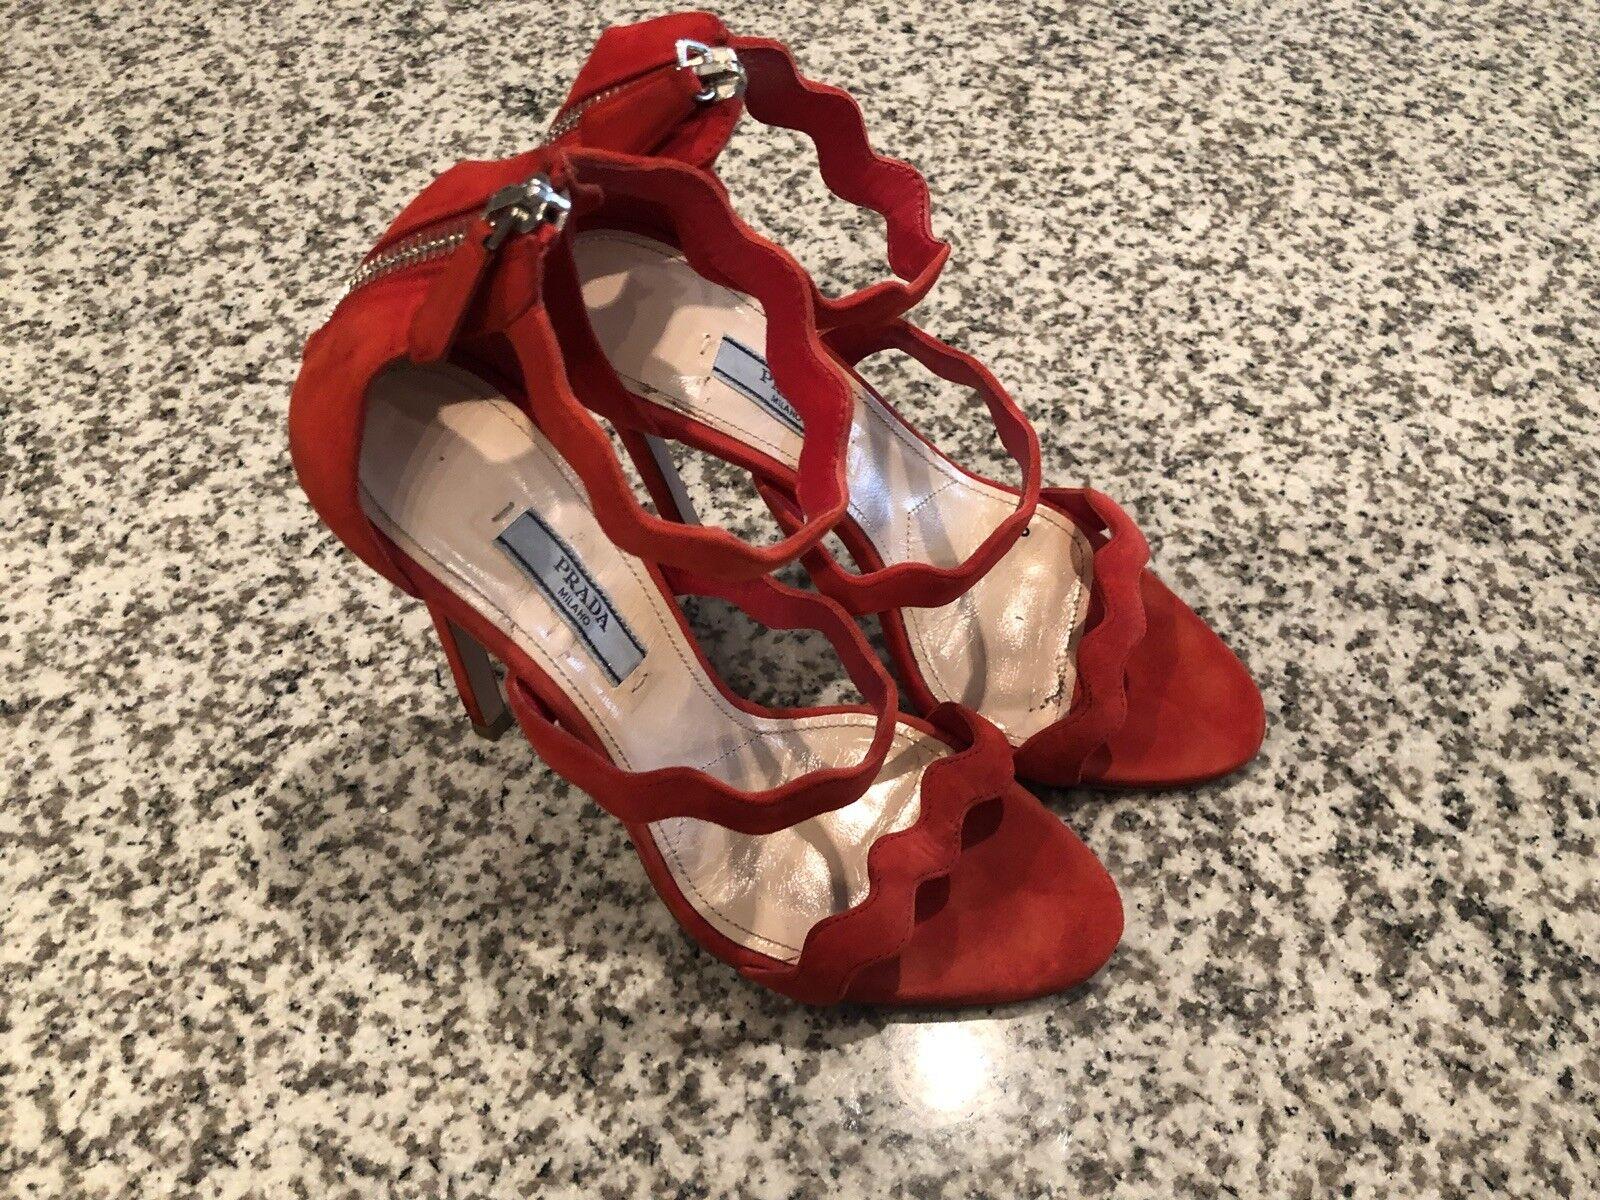 PRADA rot Orange Wavy Suede Sandals Sandals Sandals Heels CELEB FAV rot CARPET RUNWAY Größe 37 800787